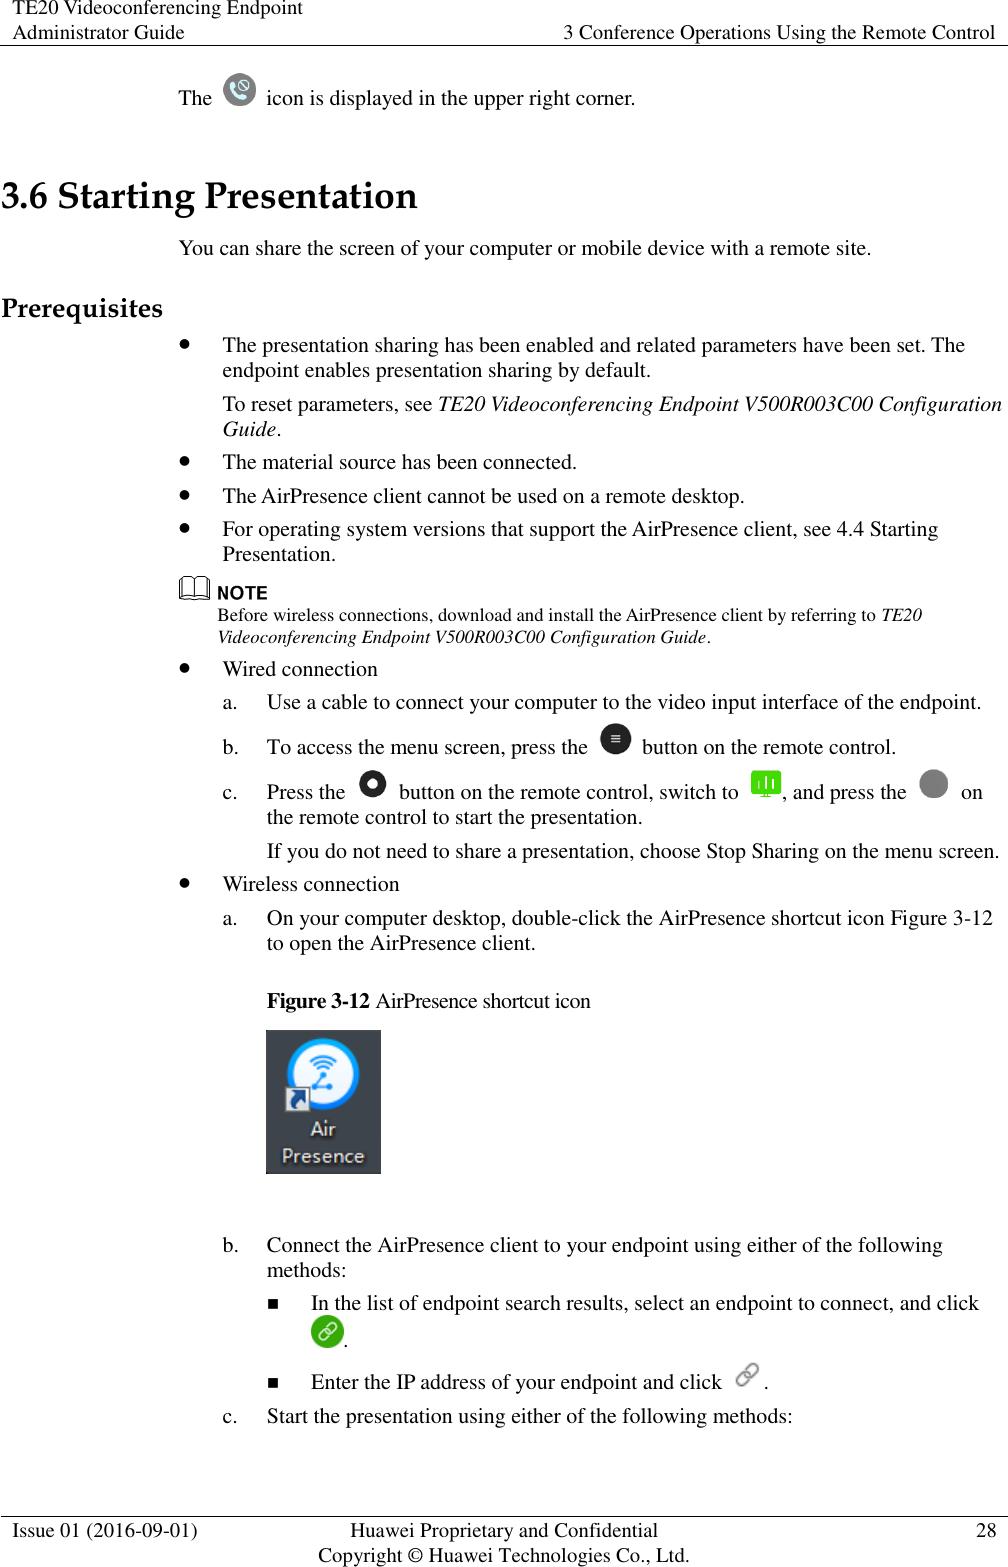 hp access control admin guide